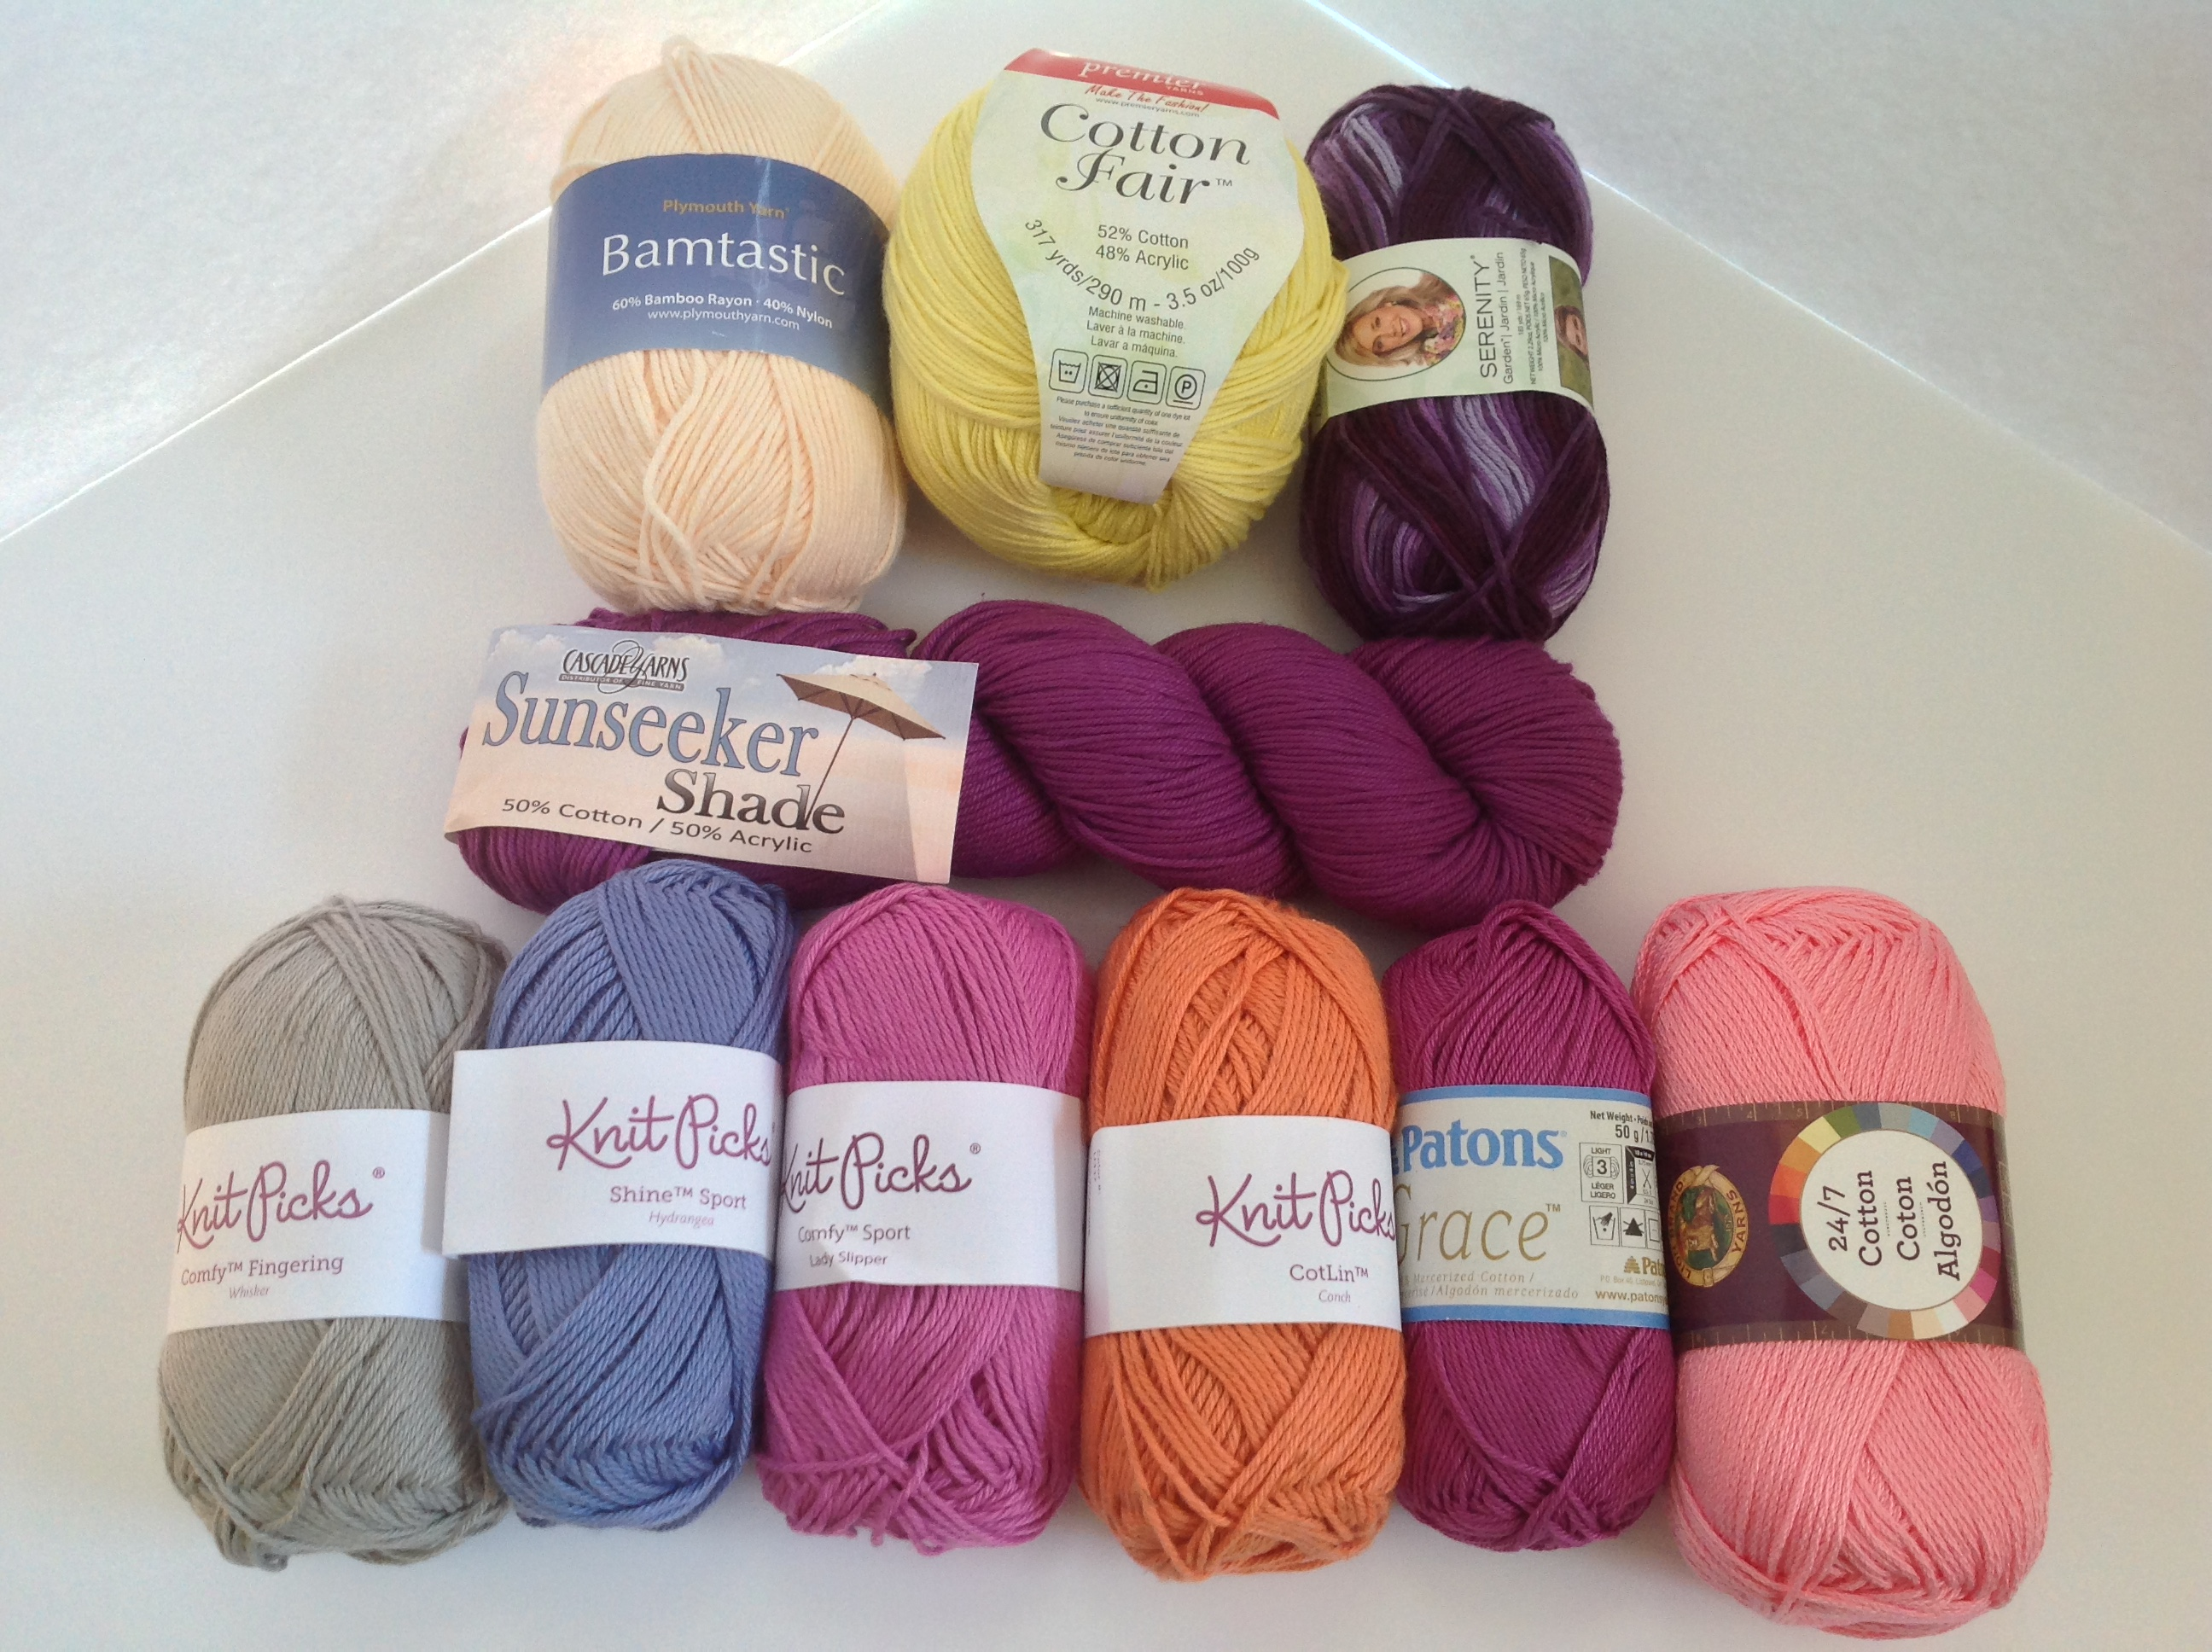 My New Favorite Yarns for Amigurumi | Fanciful Handmade Things